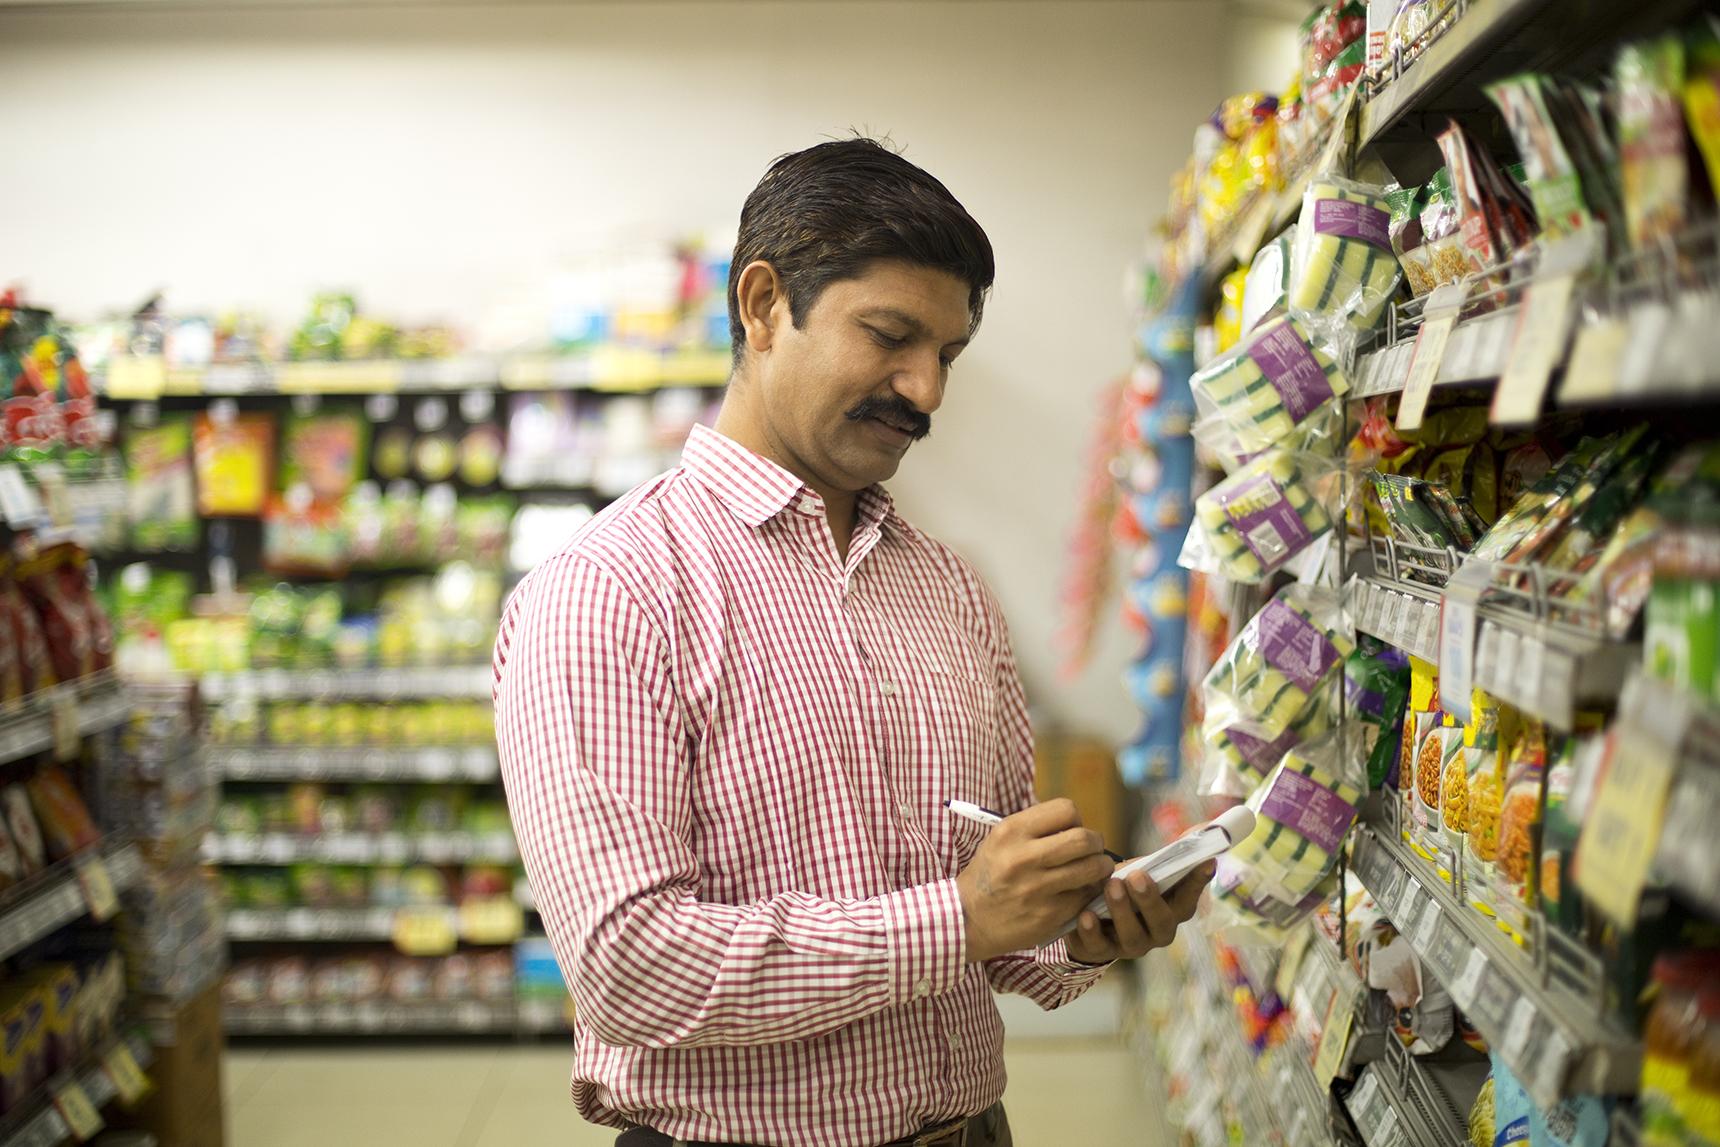 A man filling shelfs